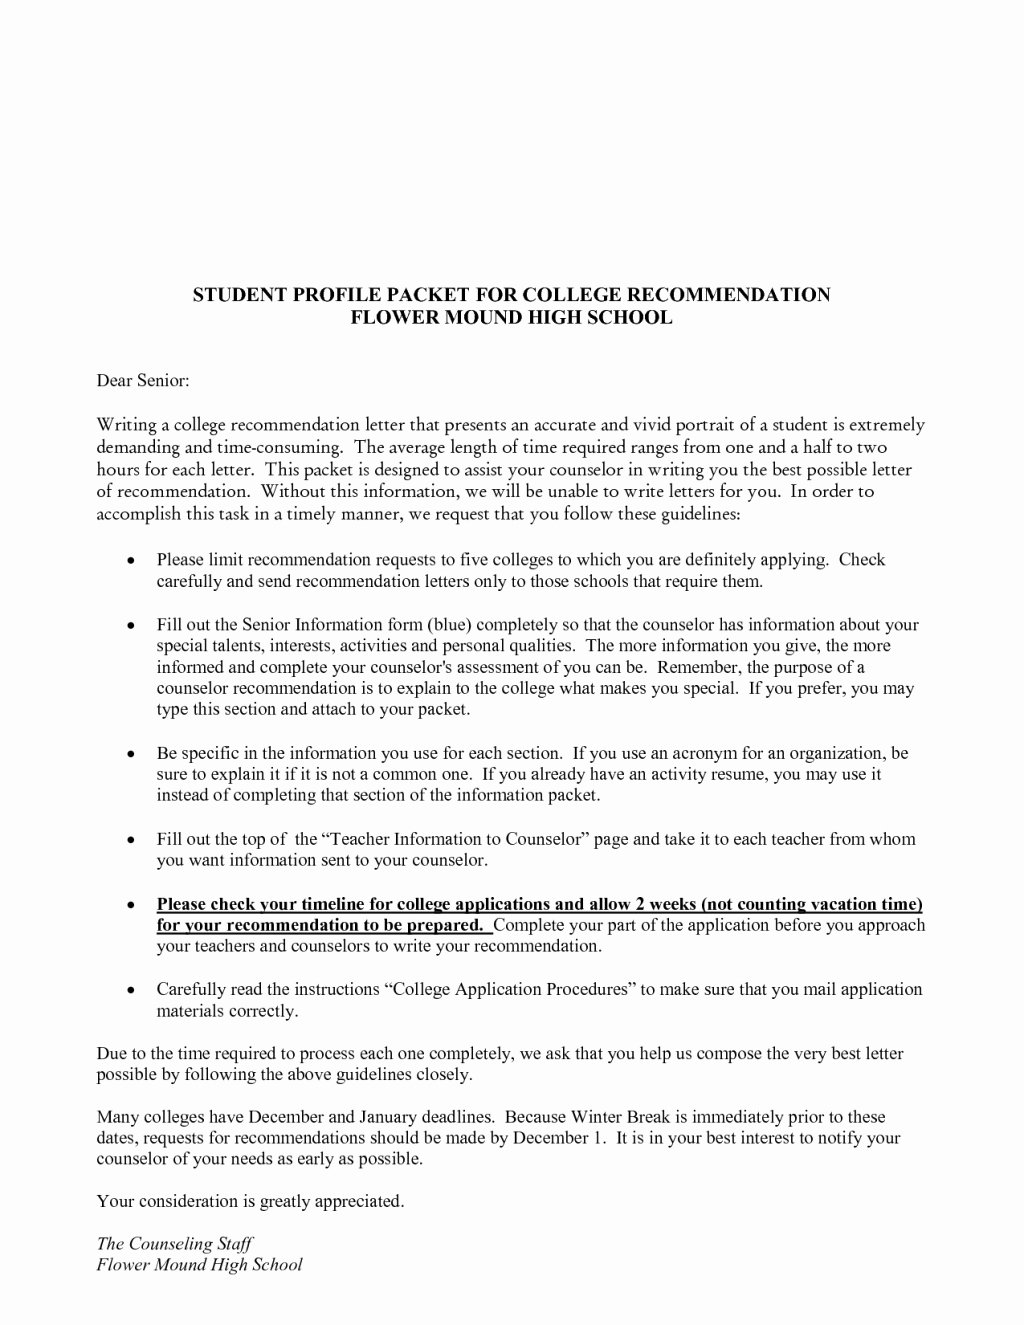 Letter Of Recommendation From Alumni Unique Alumni Letter Re Mendation Template Samples